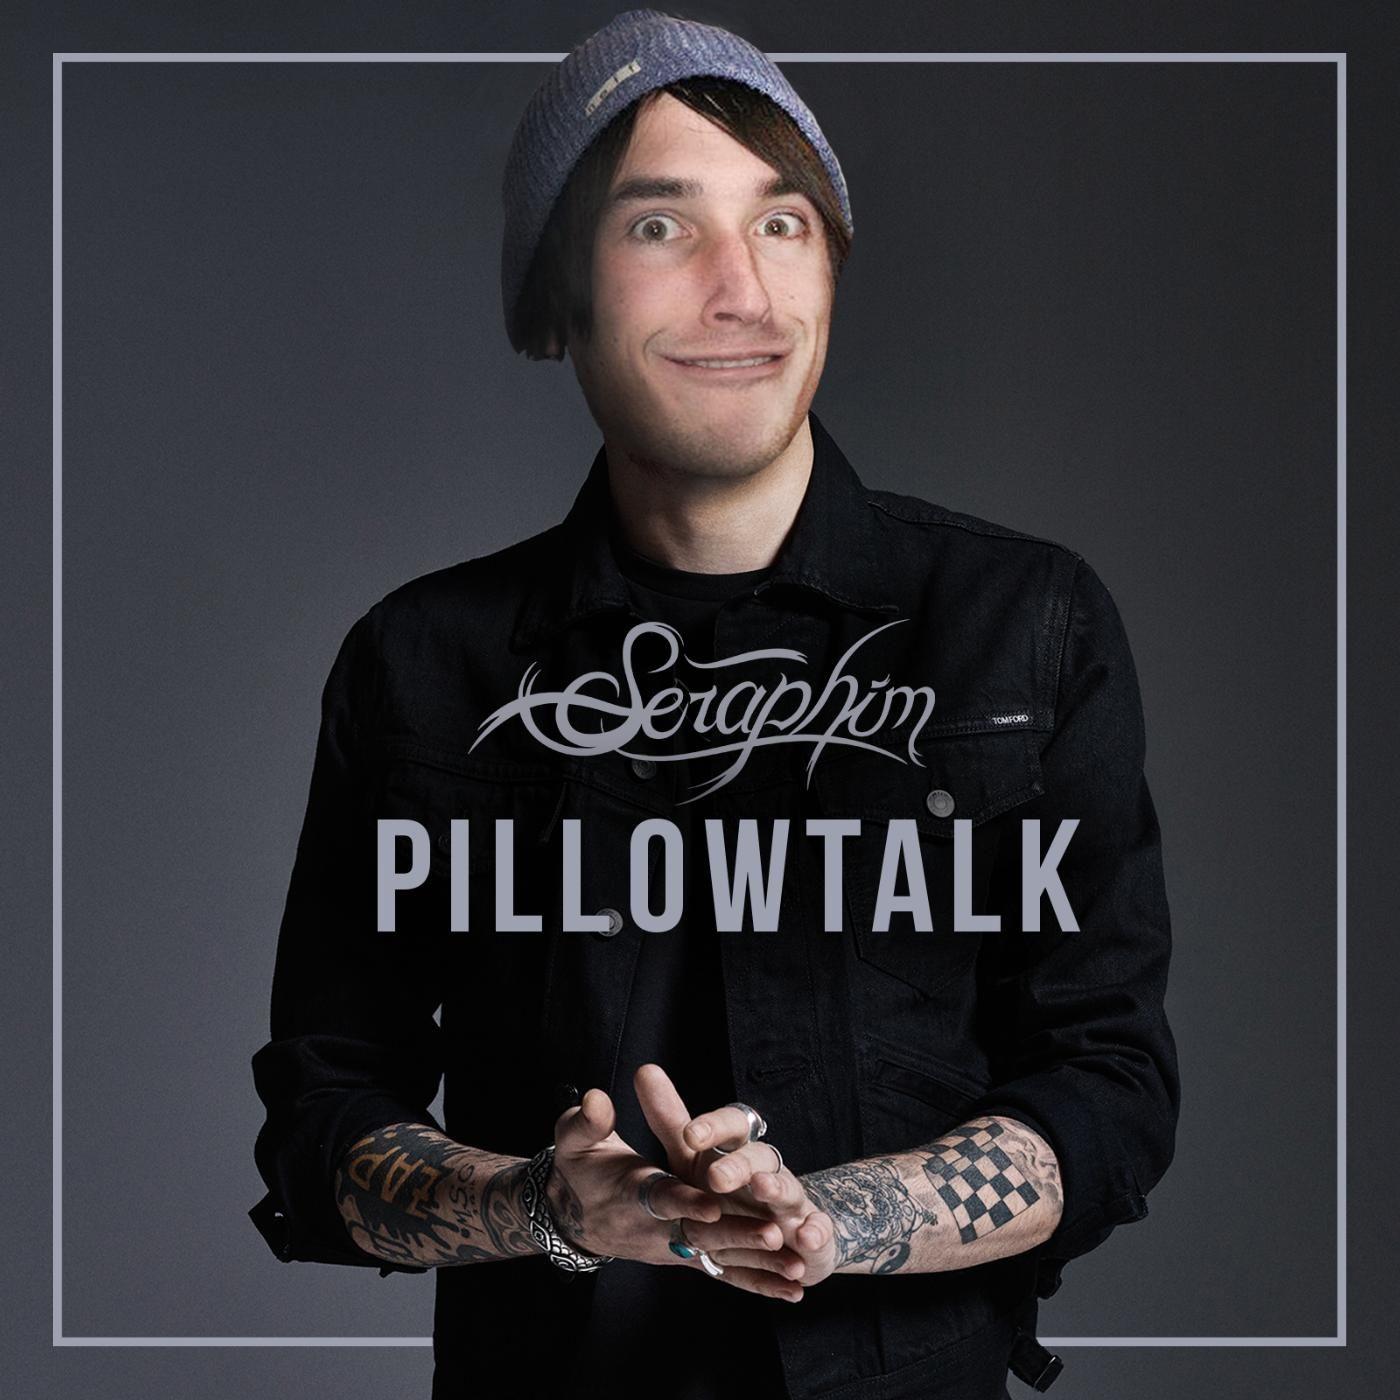 Seraphim - Pillowtalk [single] (2016)